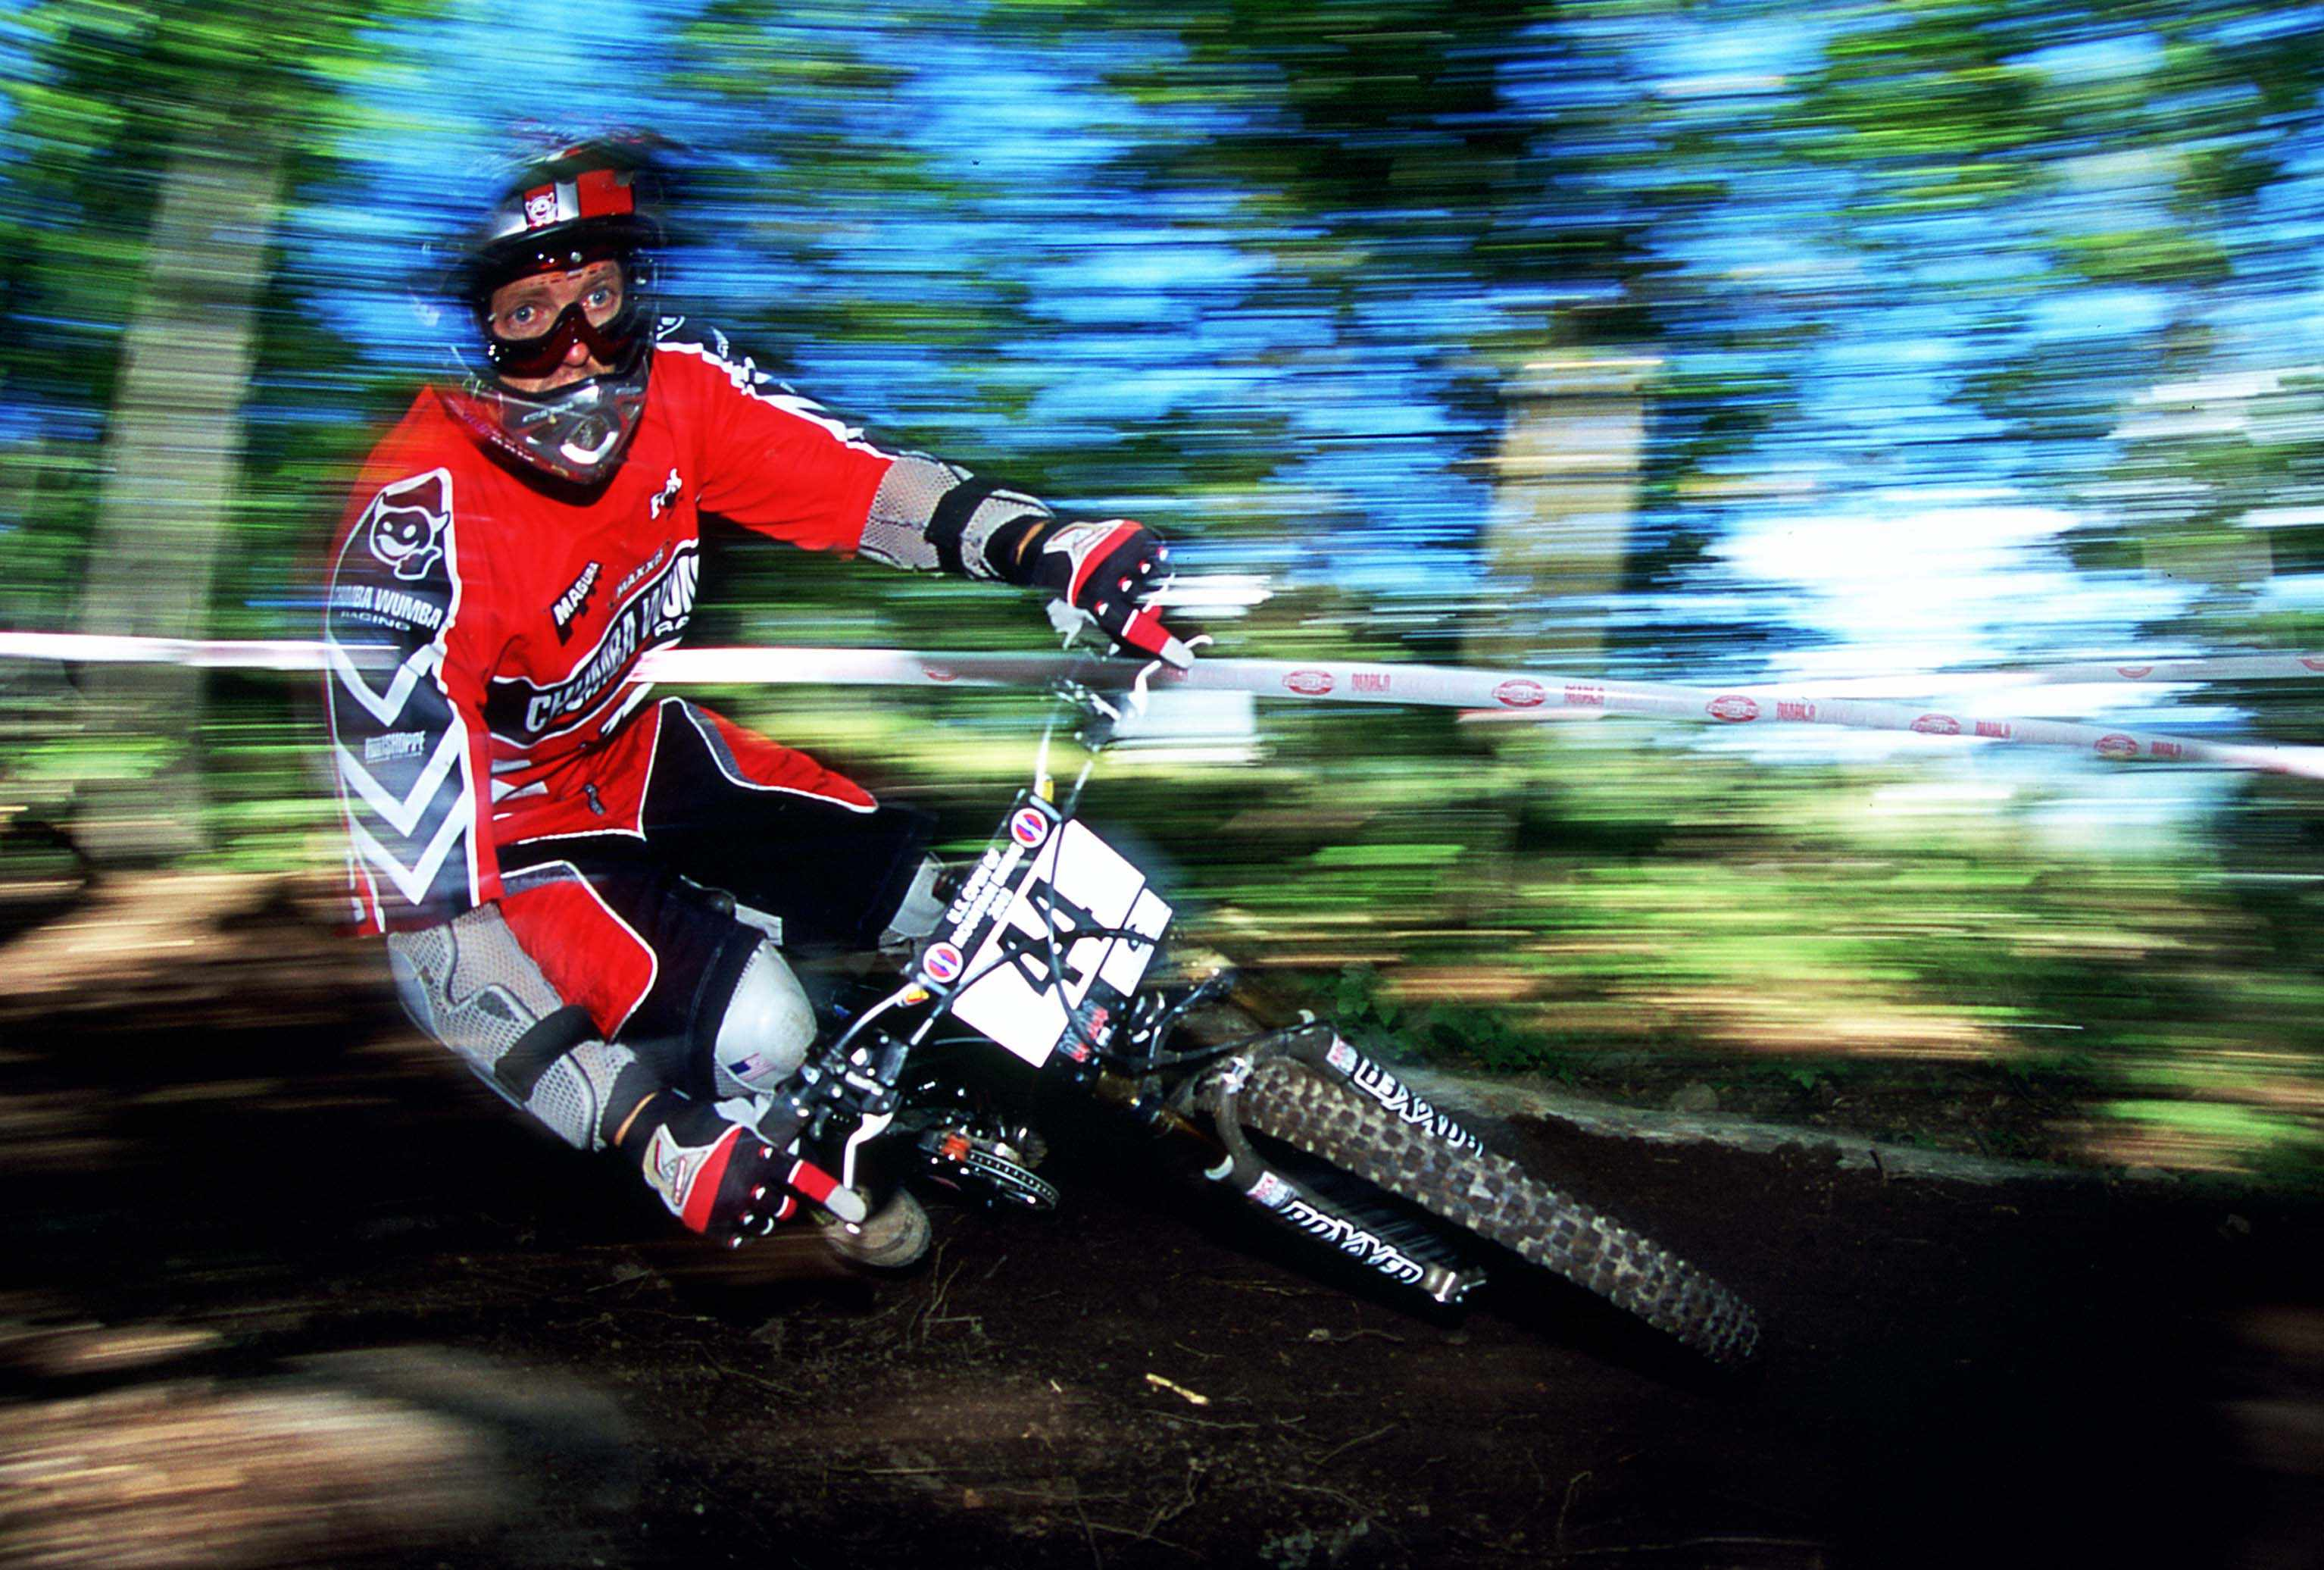 Lars Tribus racing in 2007.